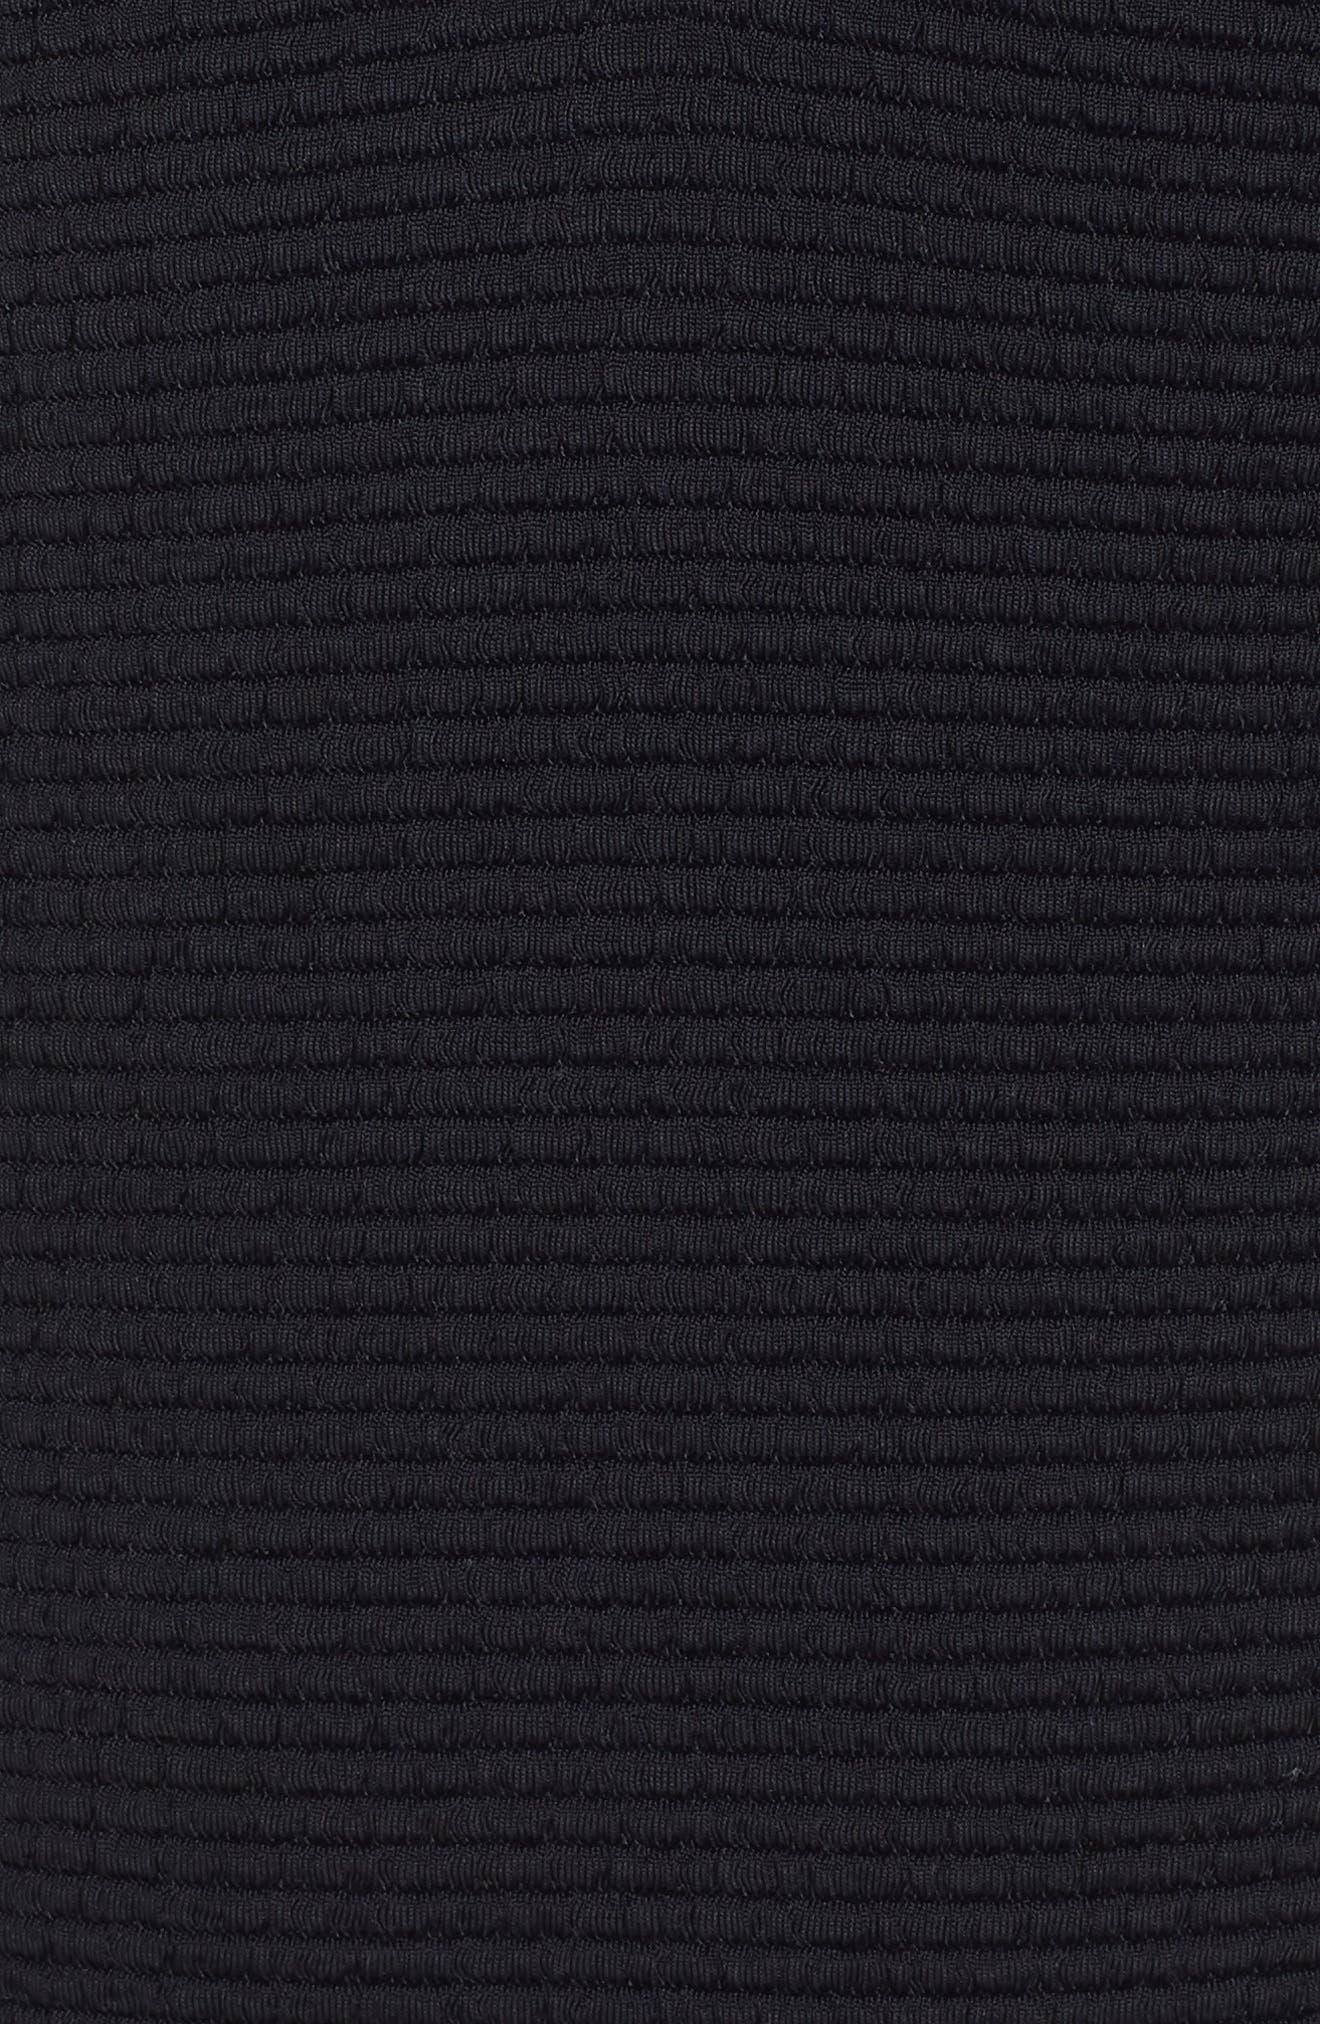 Malibu One-Piece Swimsuit,                             Alternate thumbnail 5, color,                             BLACK